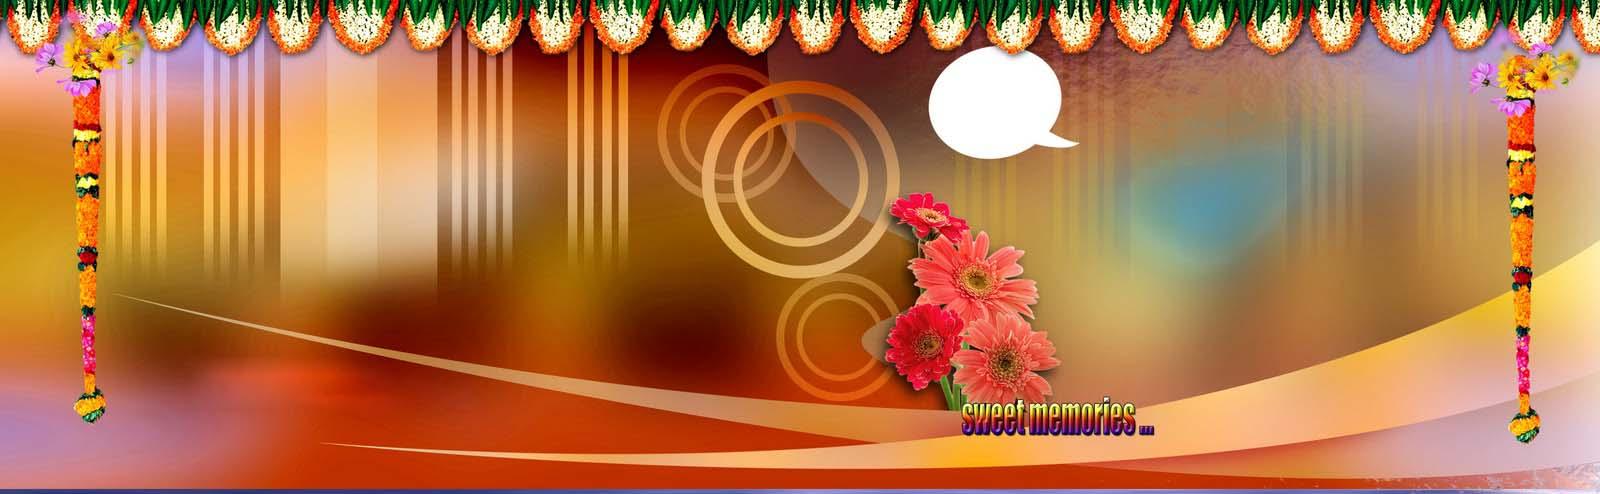 delhi tv tower image nsugHKCF